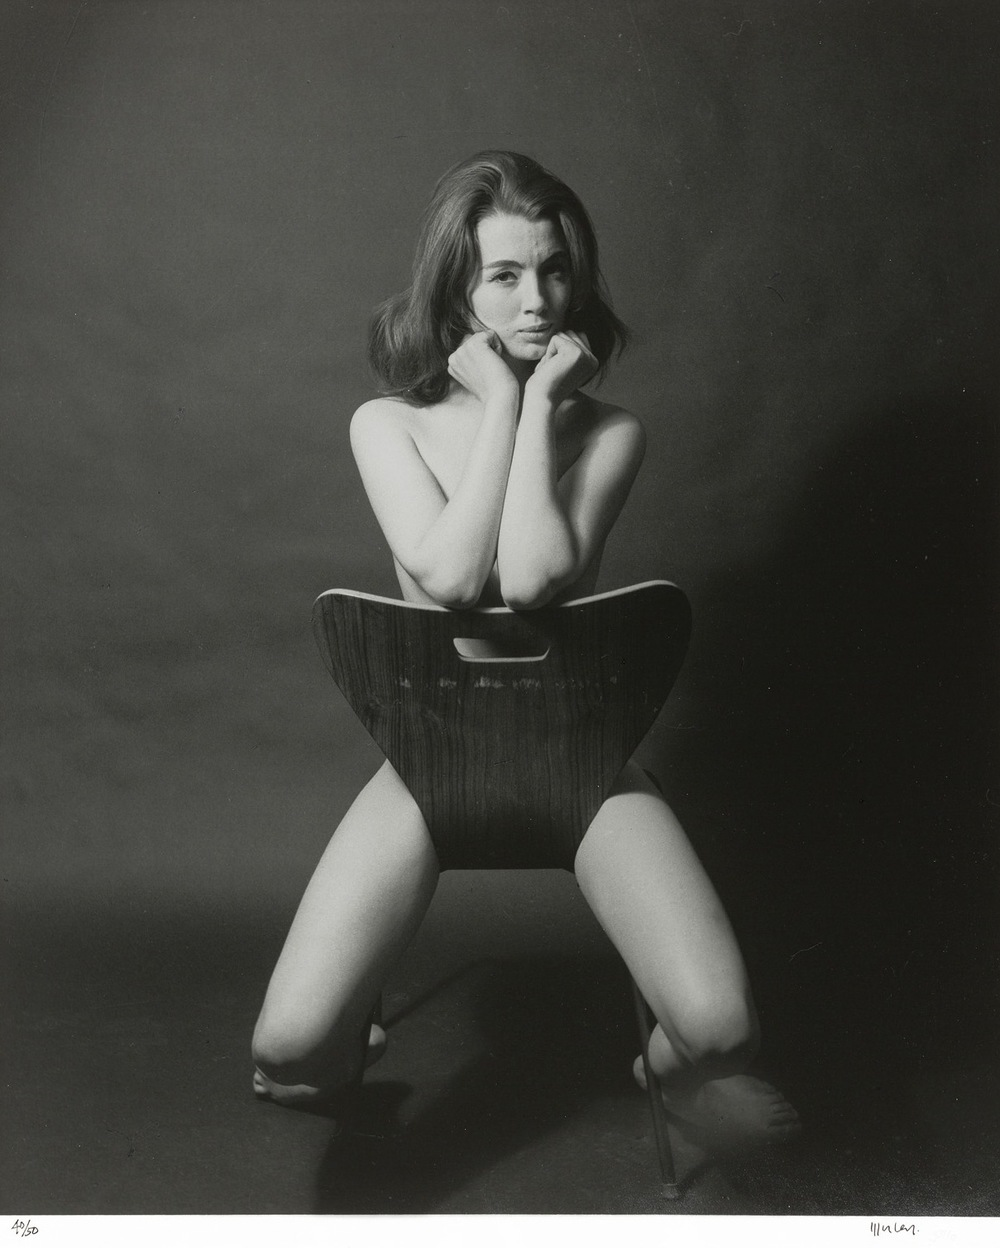 Lewis Morley Christine Keeler 1963 silver gelatin photograph